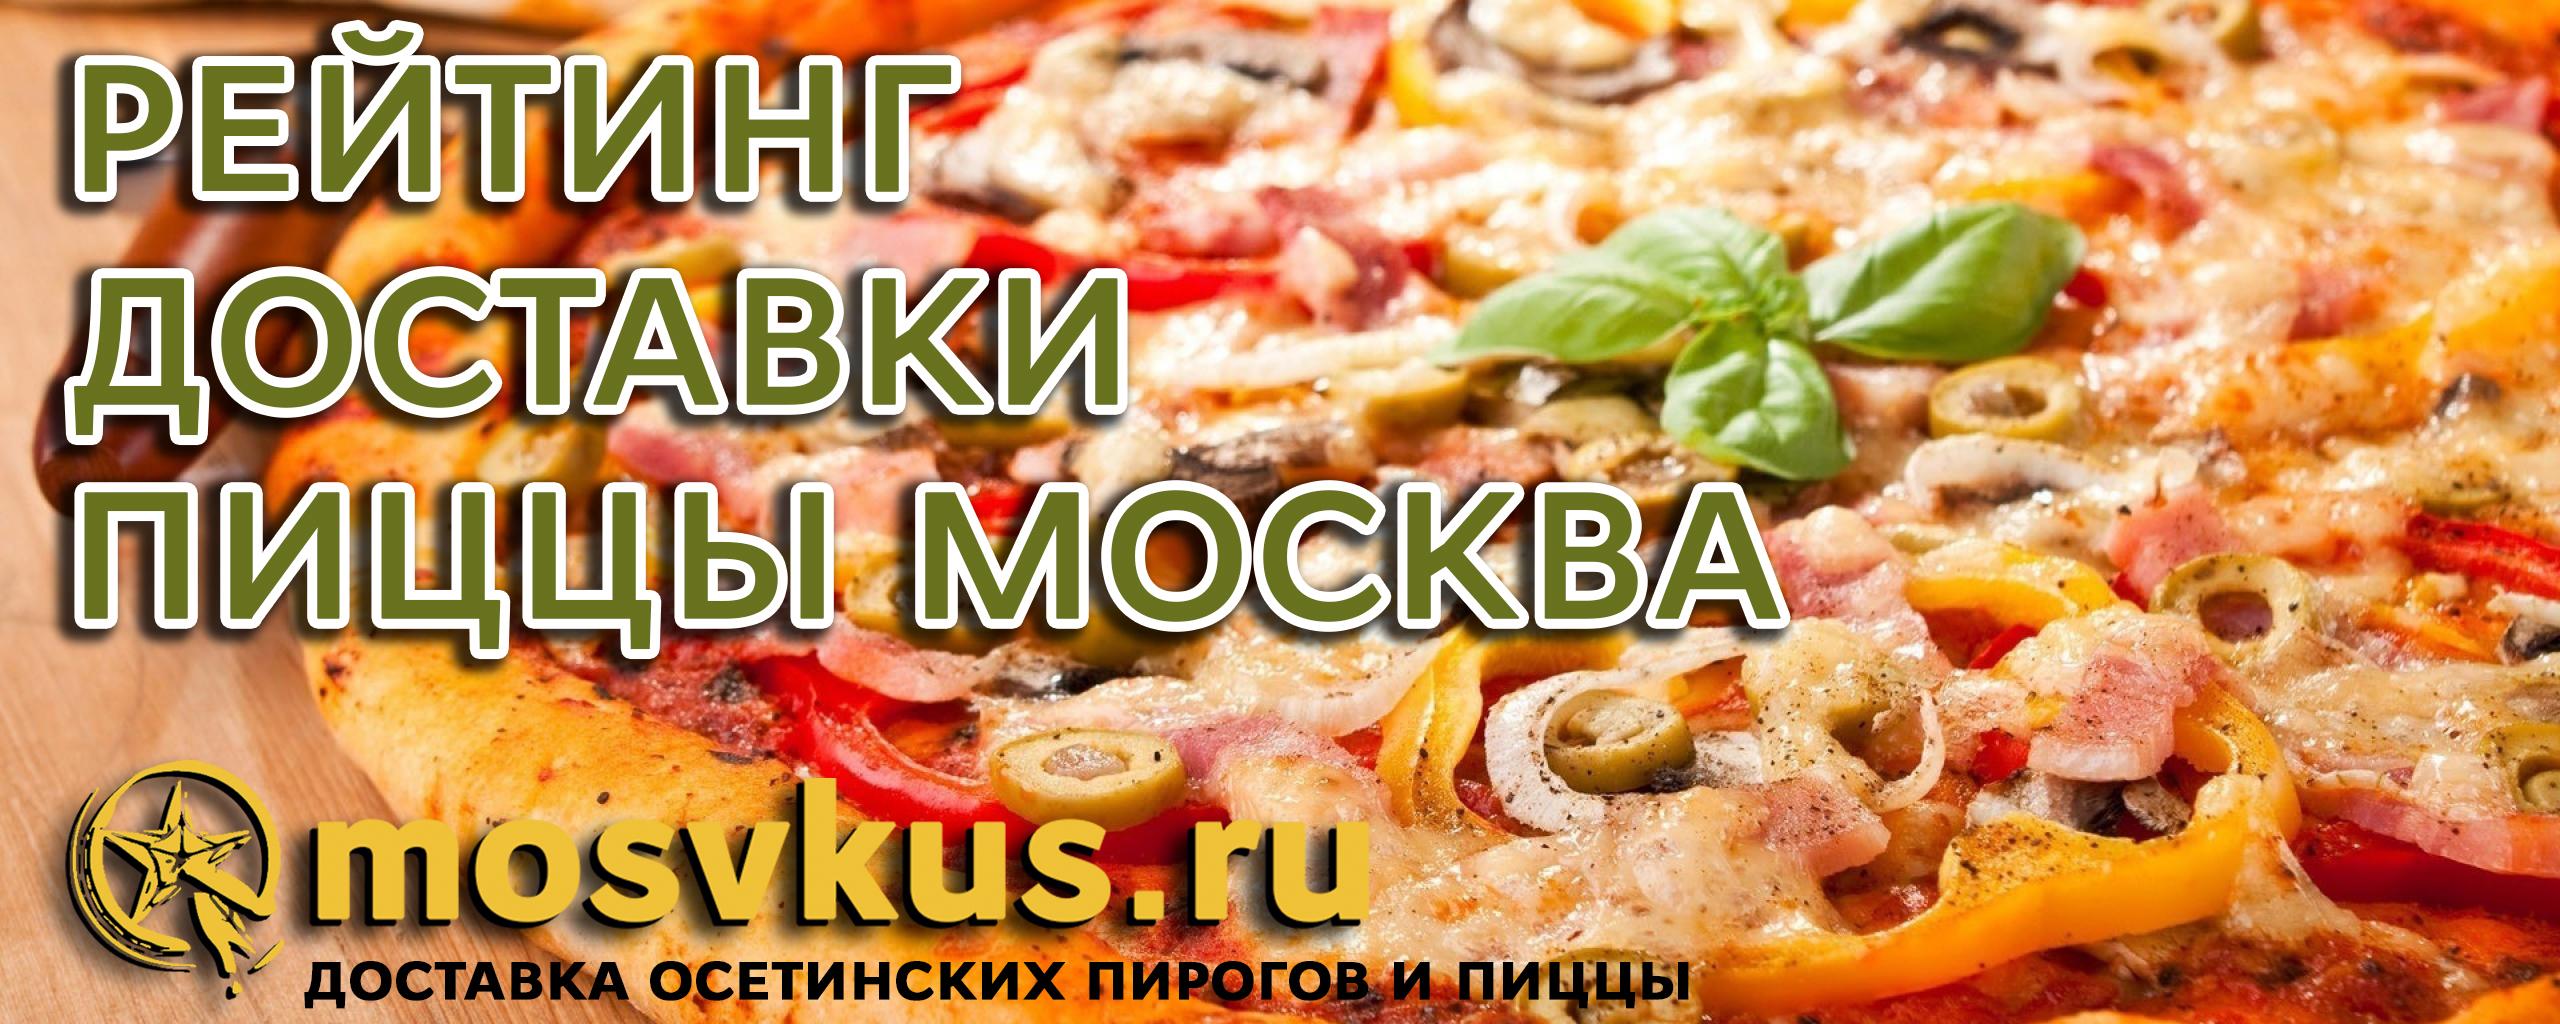 пицца доставка москва рейтинг